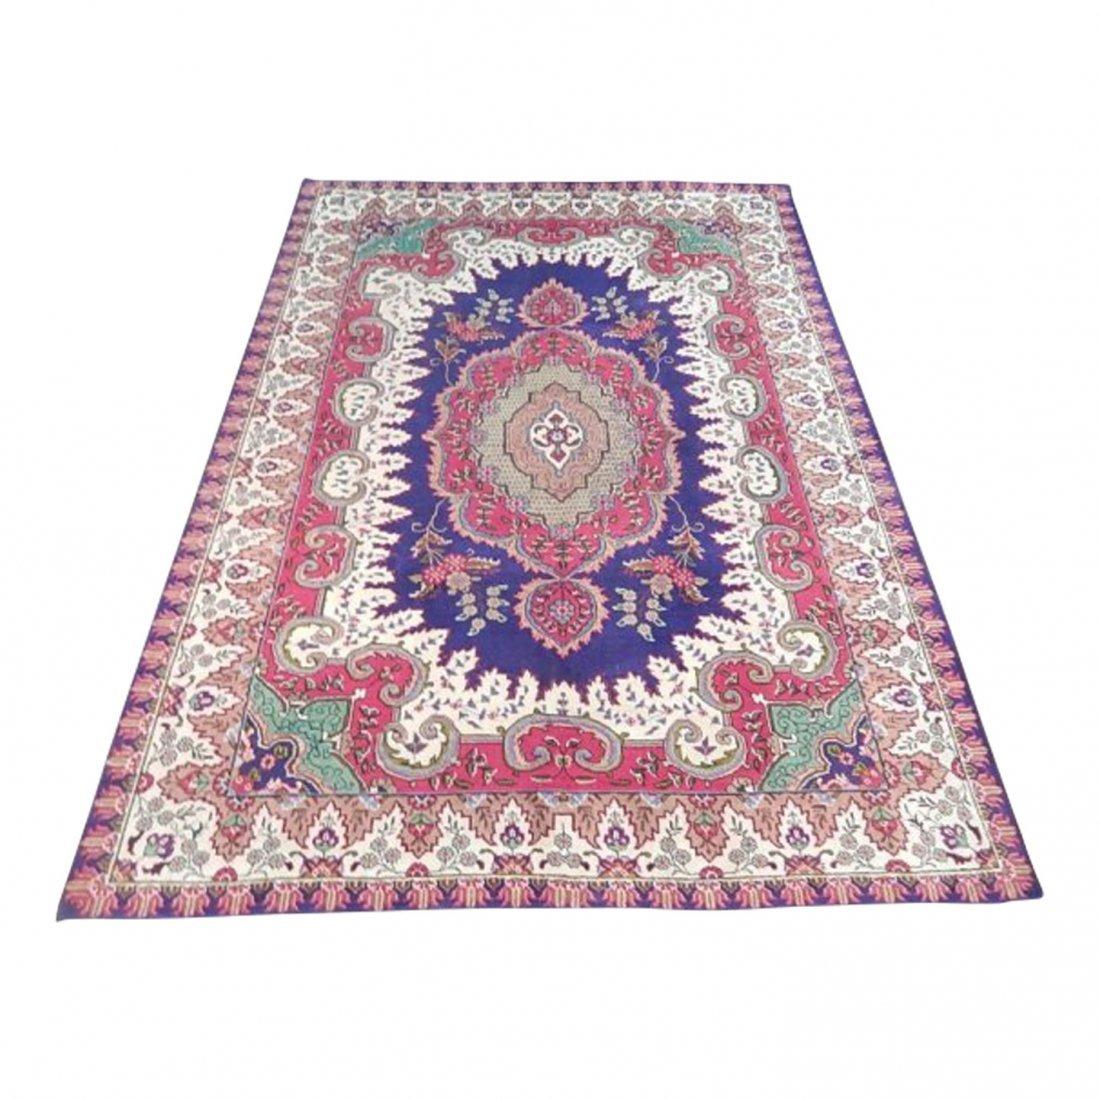 European Design Persian Tabriz Rug, 7x10